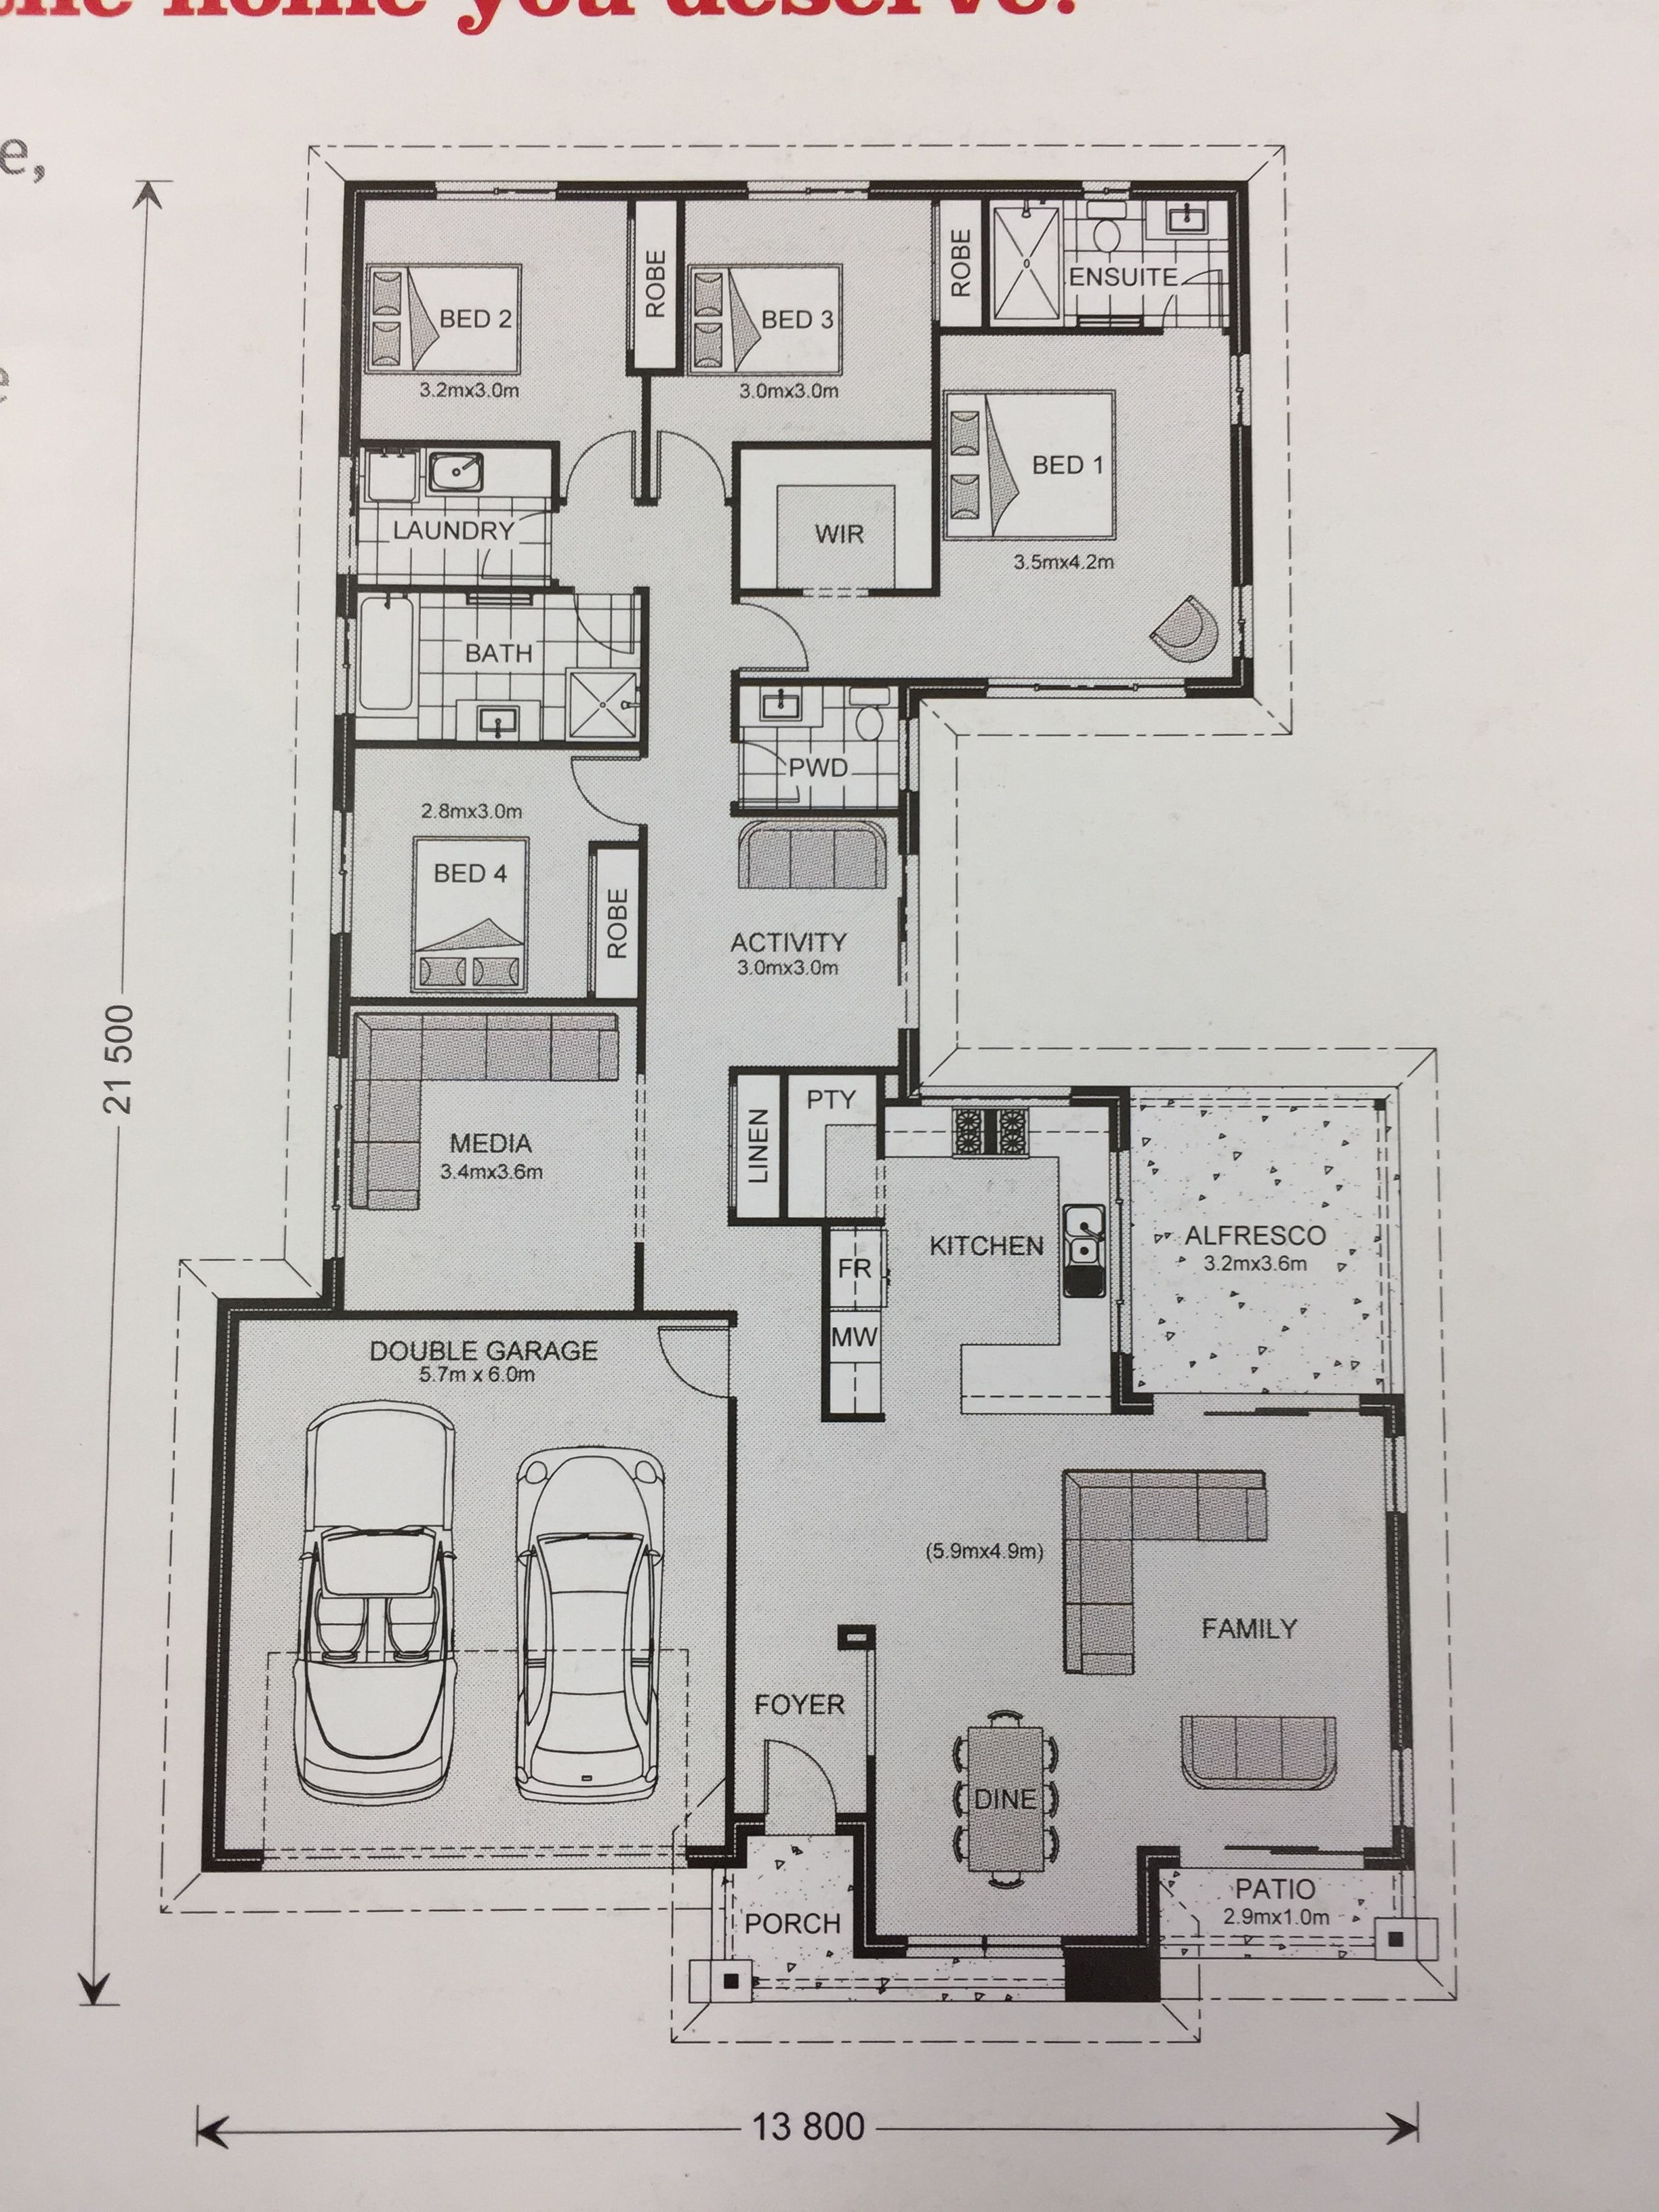 G J Gardner Homes Lakeview 234 Modern House Design Craftsman Floor Plans House Floor Plans